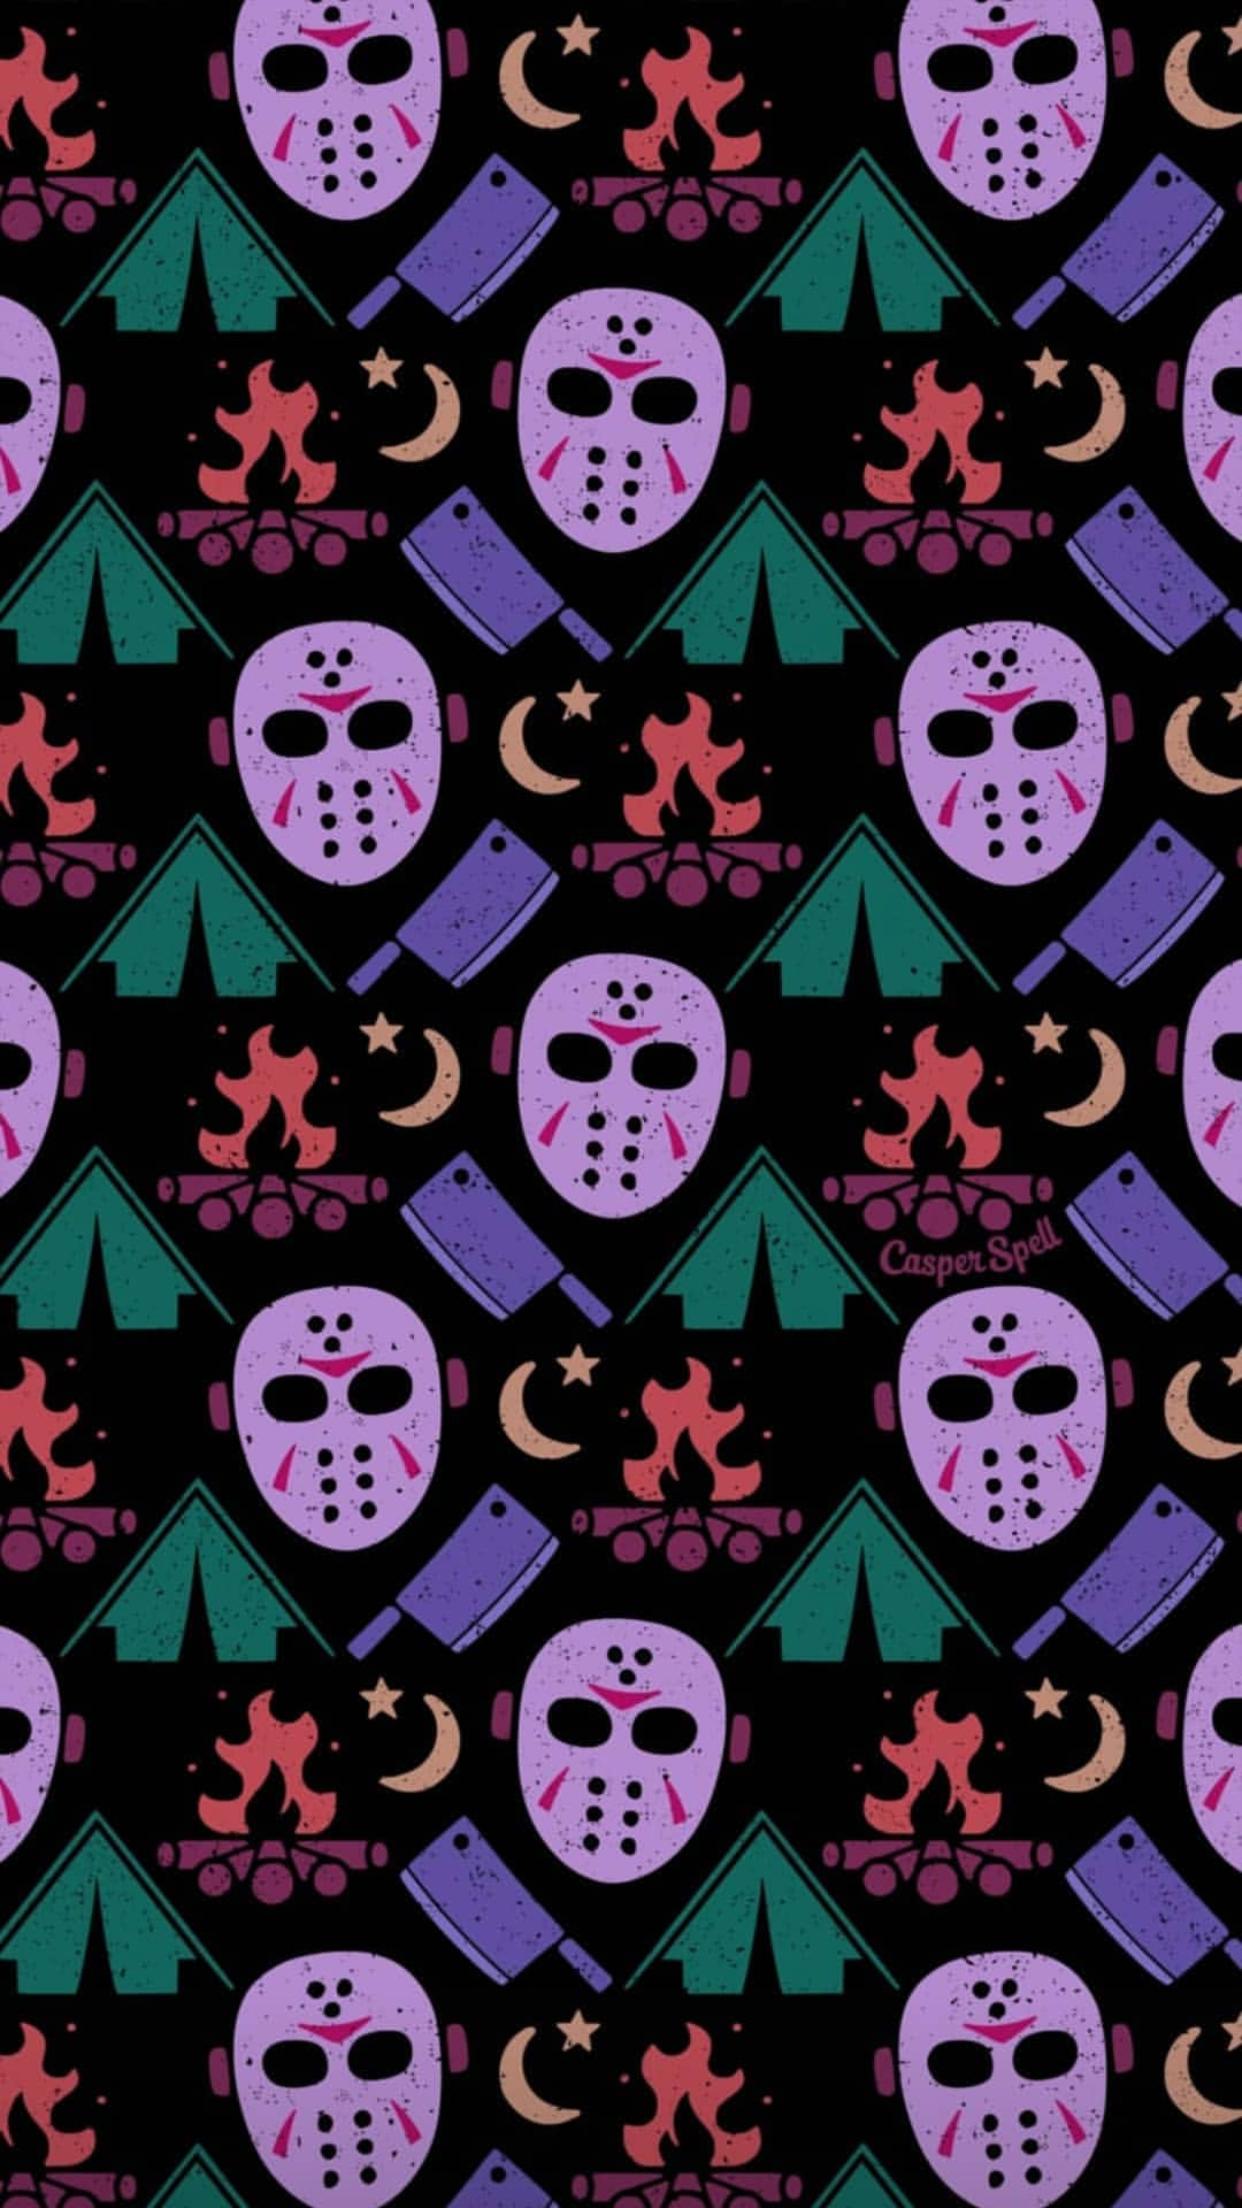 Friday The 13th Jason Voorhees Halloween Horror Movie Camp Crystal Lake Lock Screen Wallpaper Halloween Wallpaper Iphone Iphone Wallpaper Locked Wallpaper